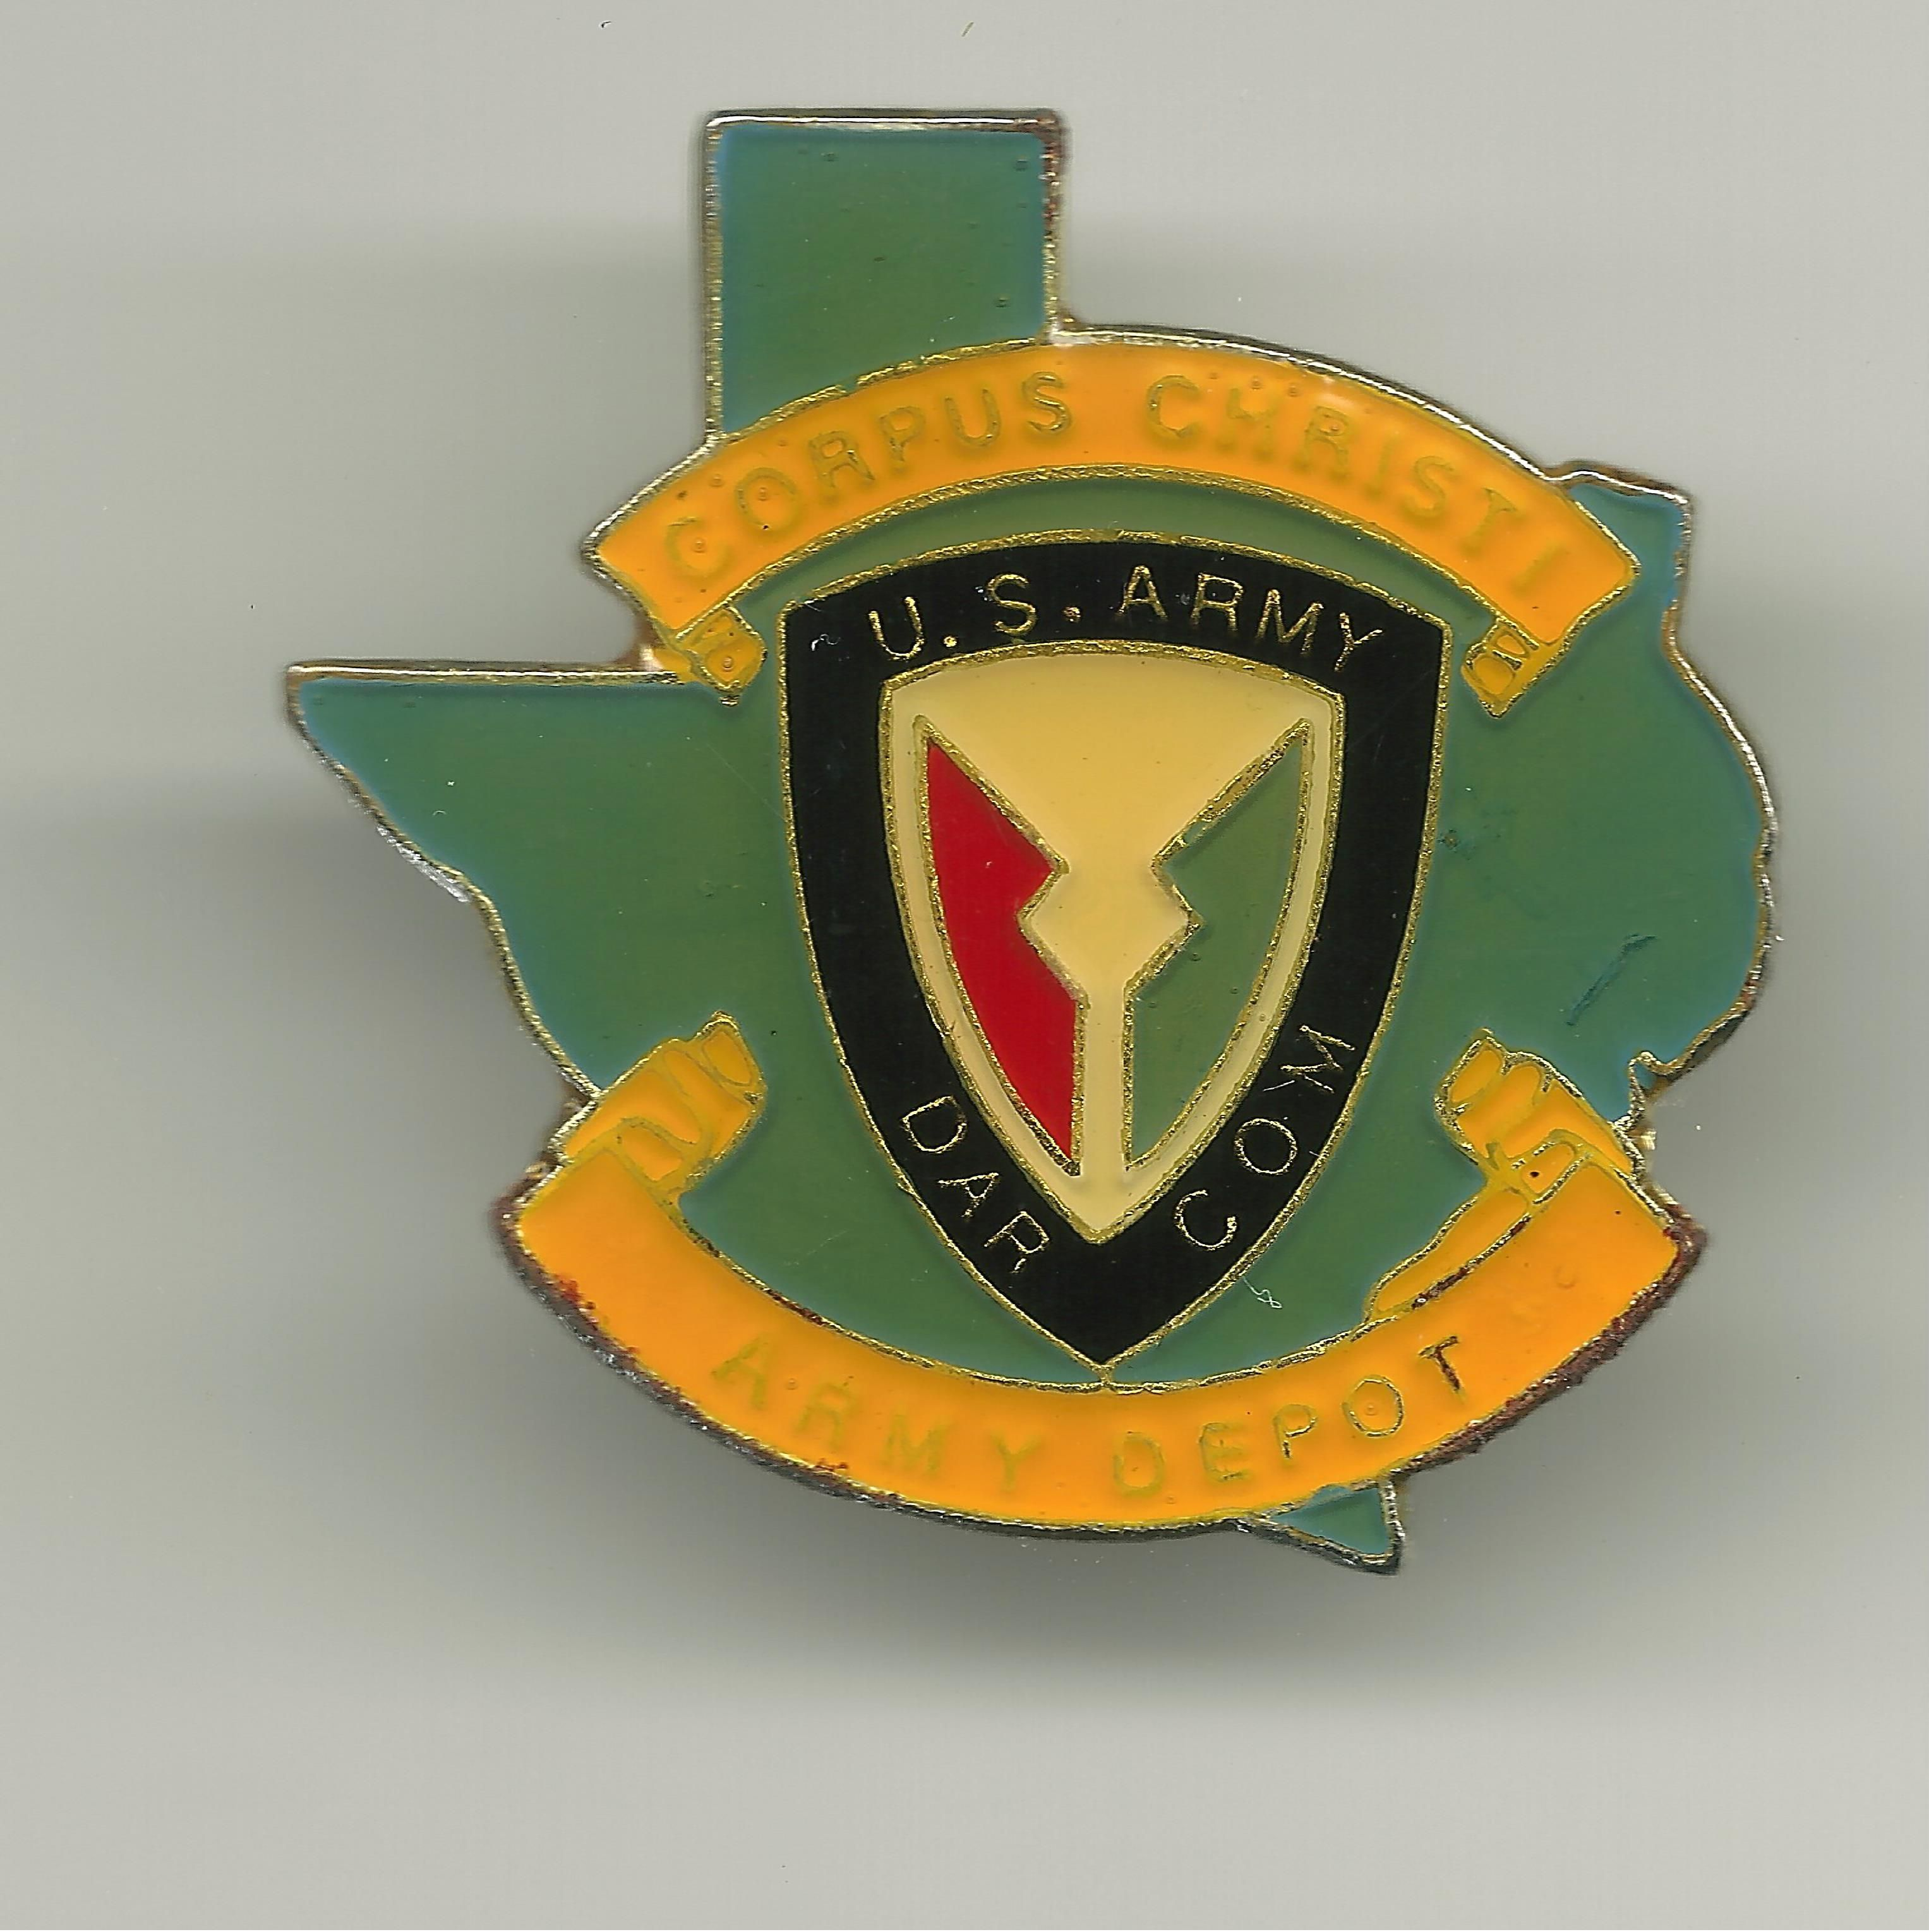 Annual Training, Iowa Army National Guard, Co. D, 109th